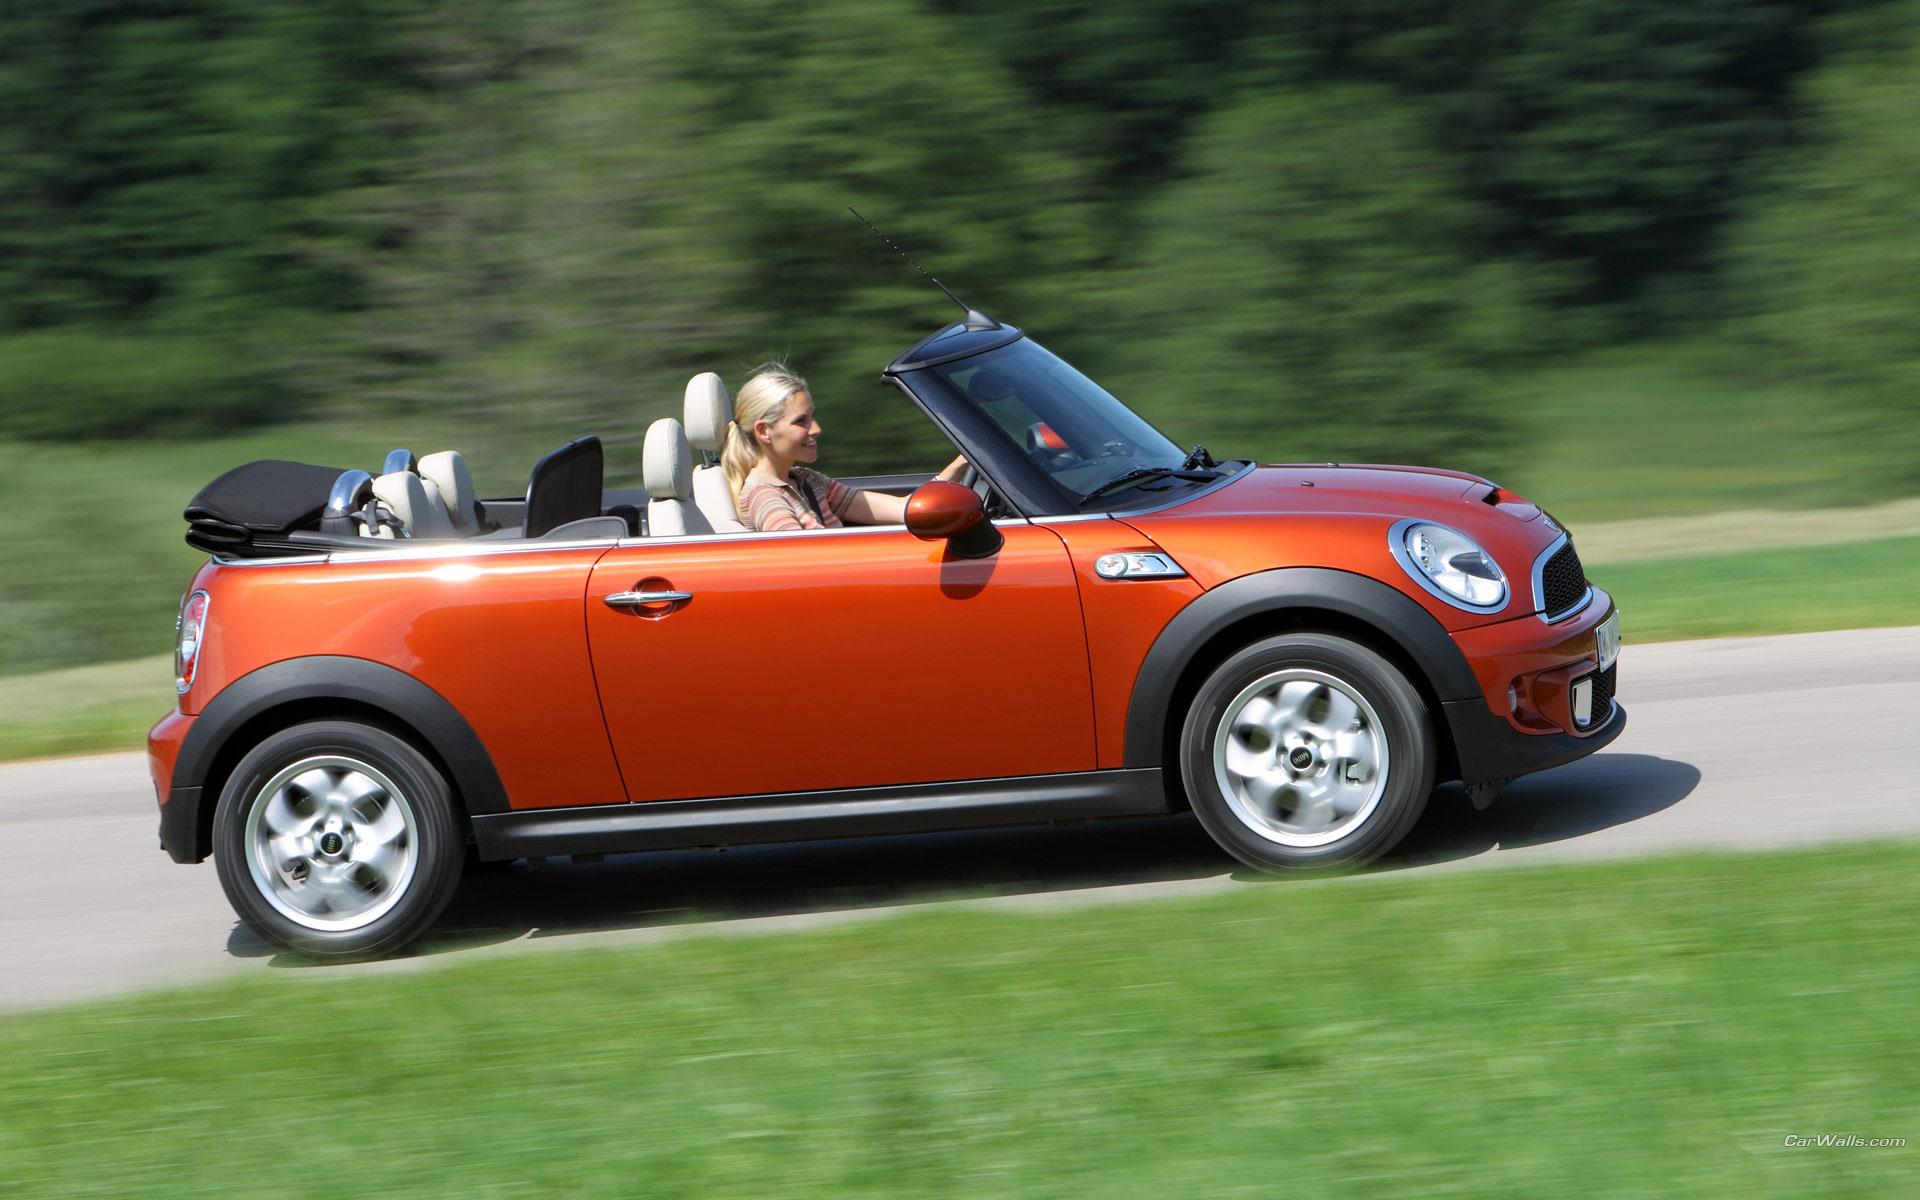 Red Mini Cooper Driving - Red Mini Cooper Driving